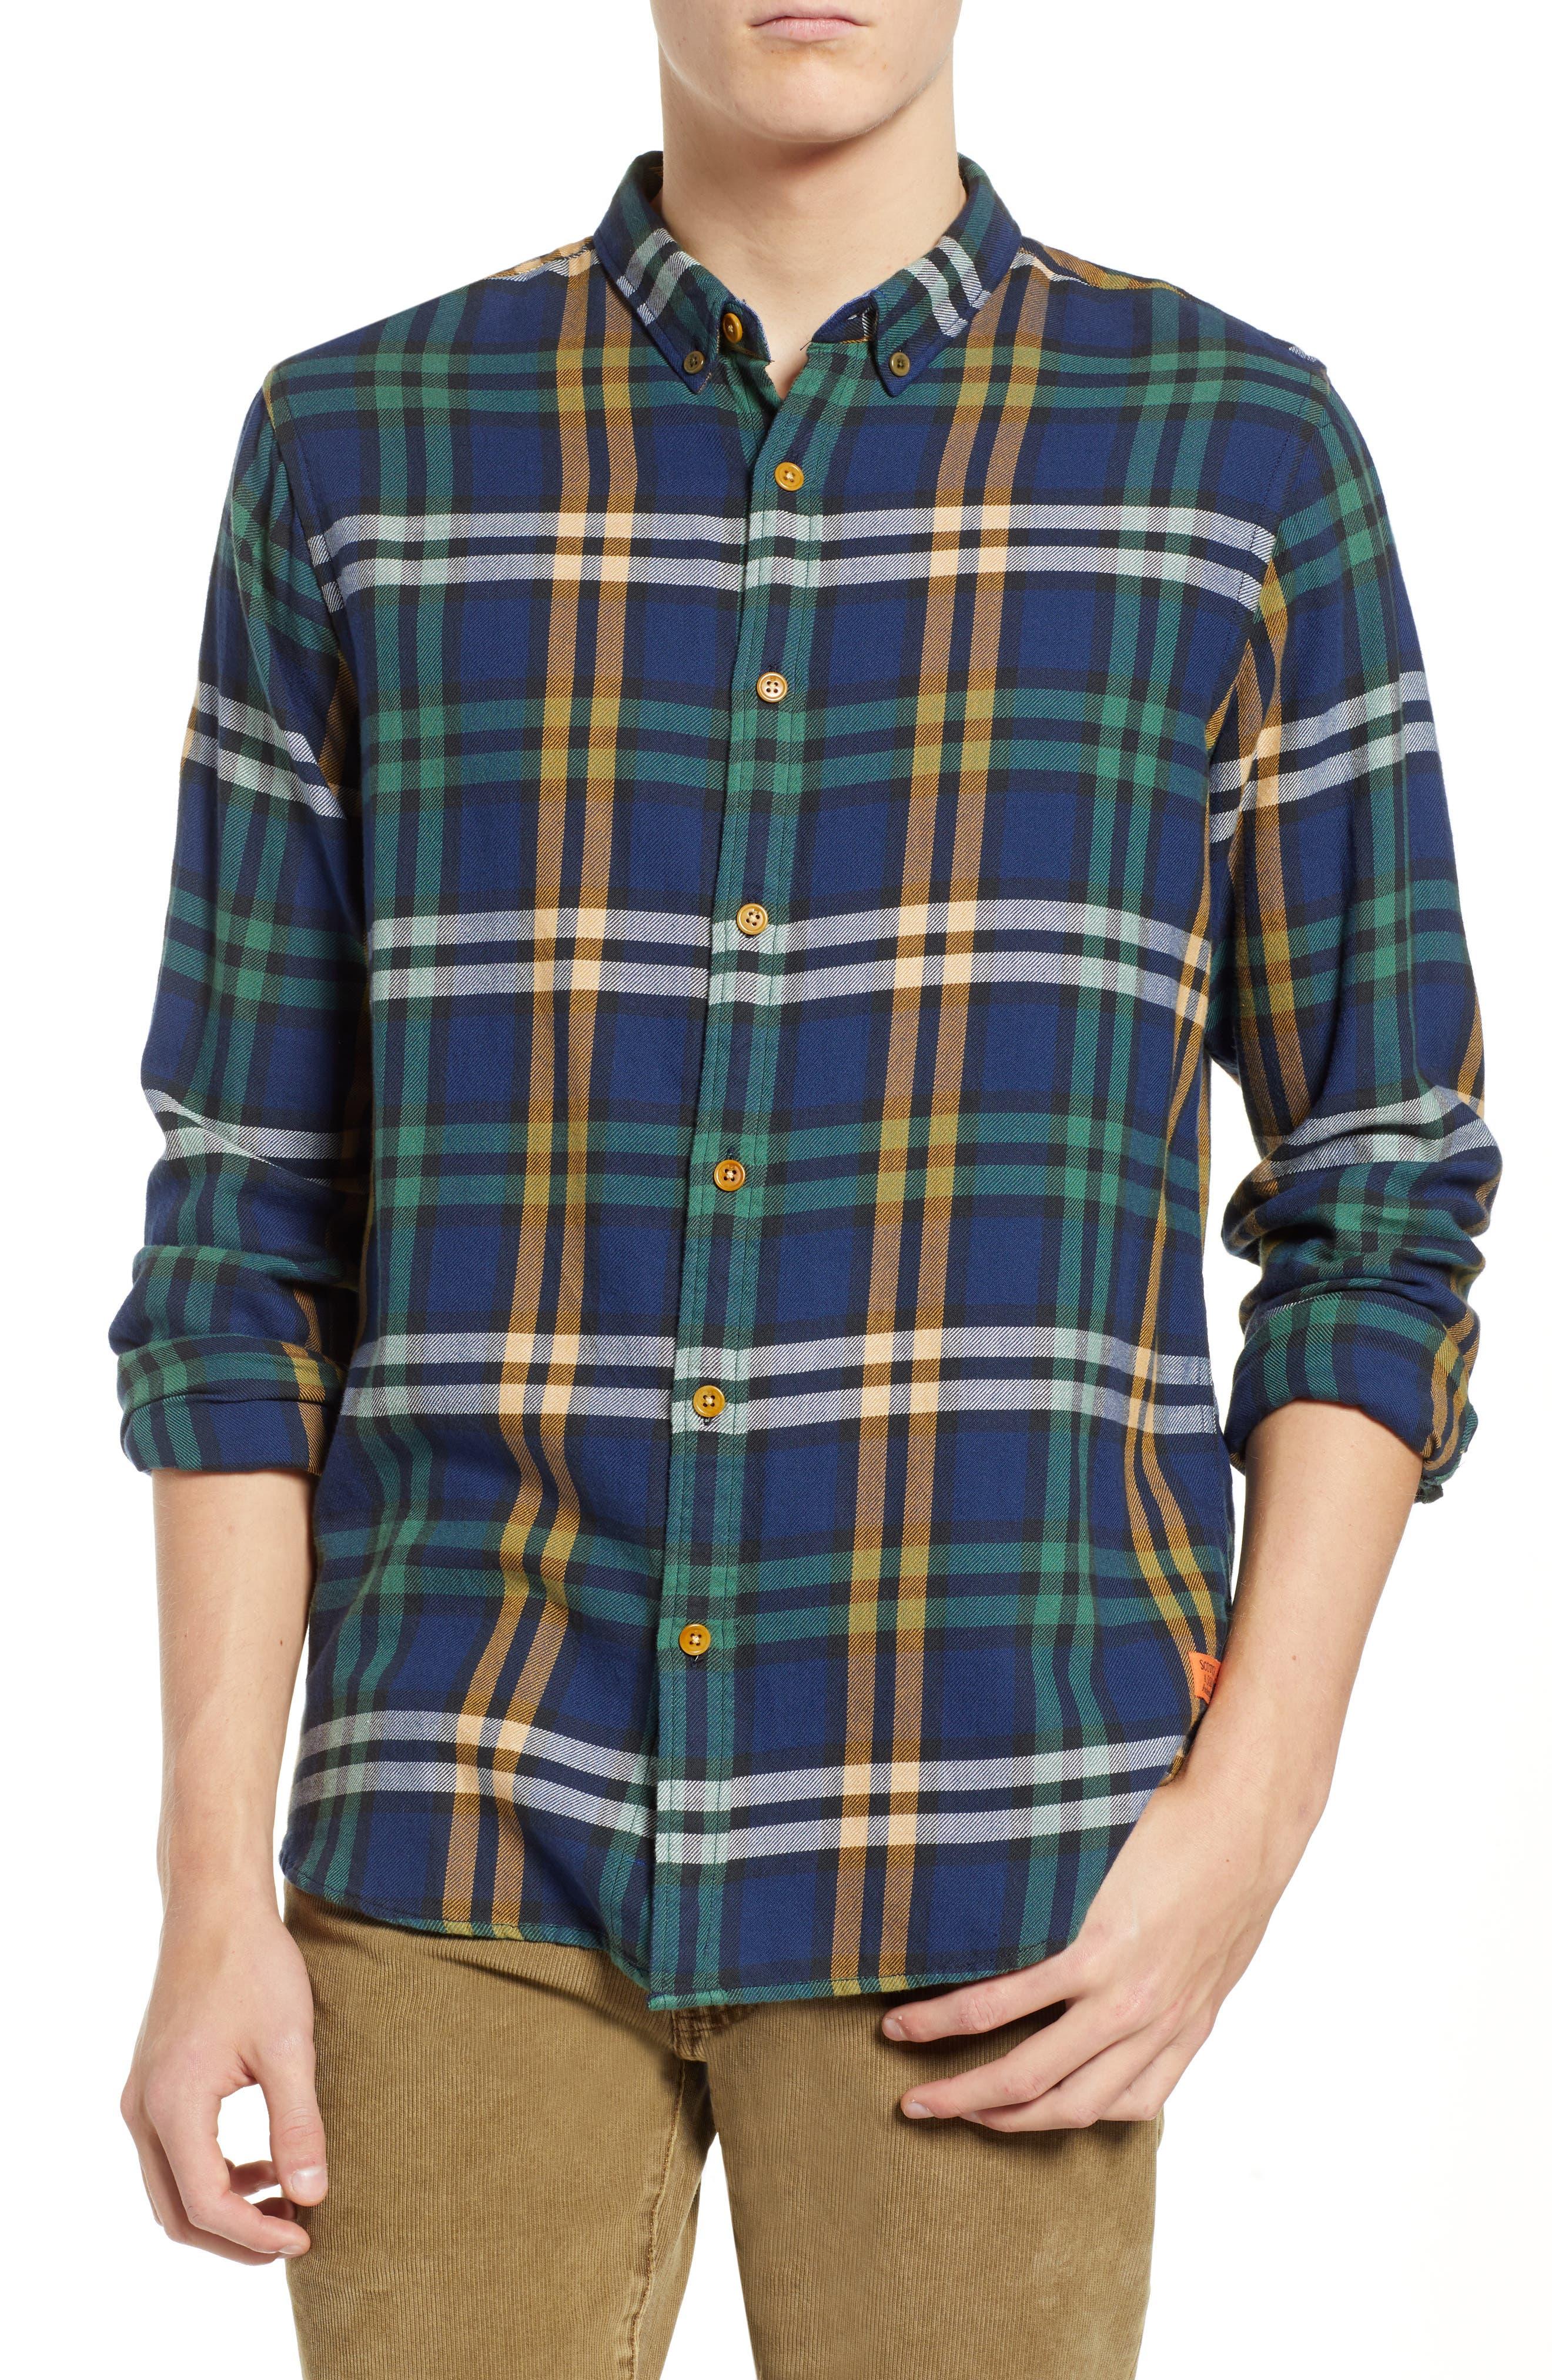 Scotch & Soda Check Flannel Shirt, Blue